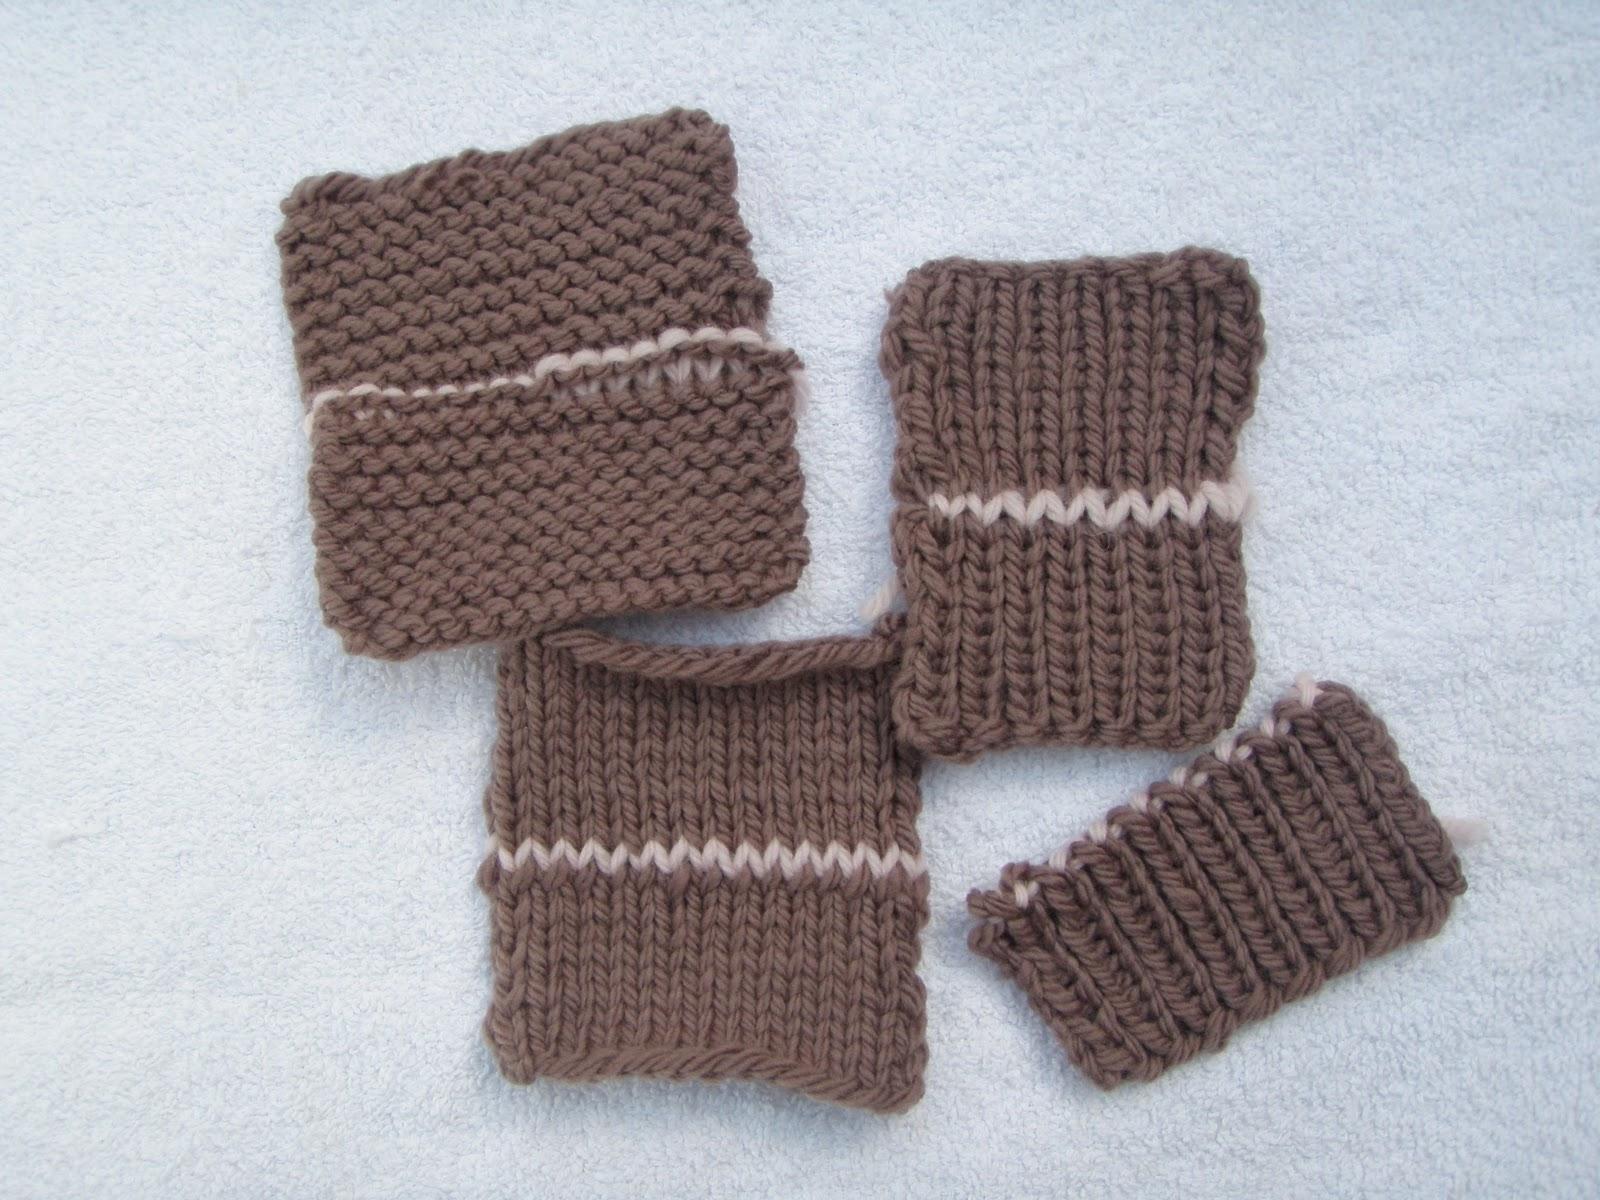 Kitchener Stitch Combination Knitting : annbuddknits: Two New Classes